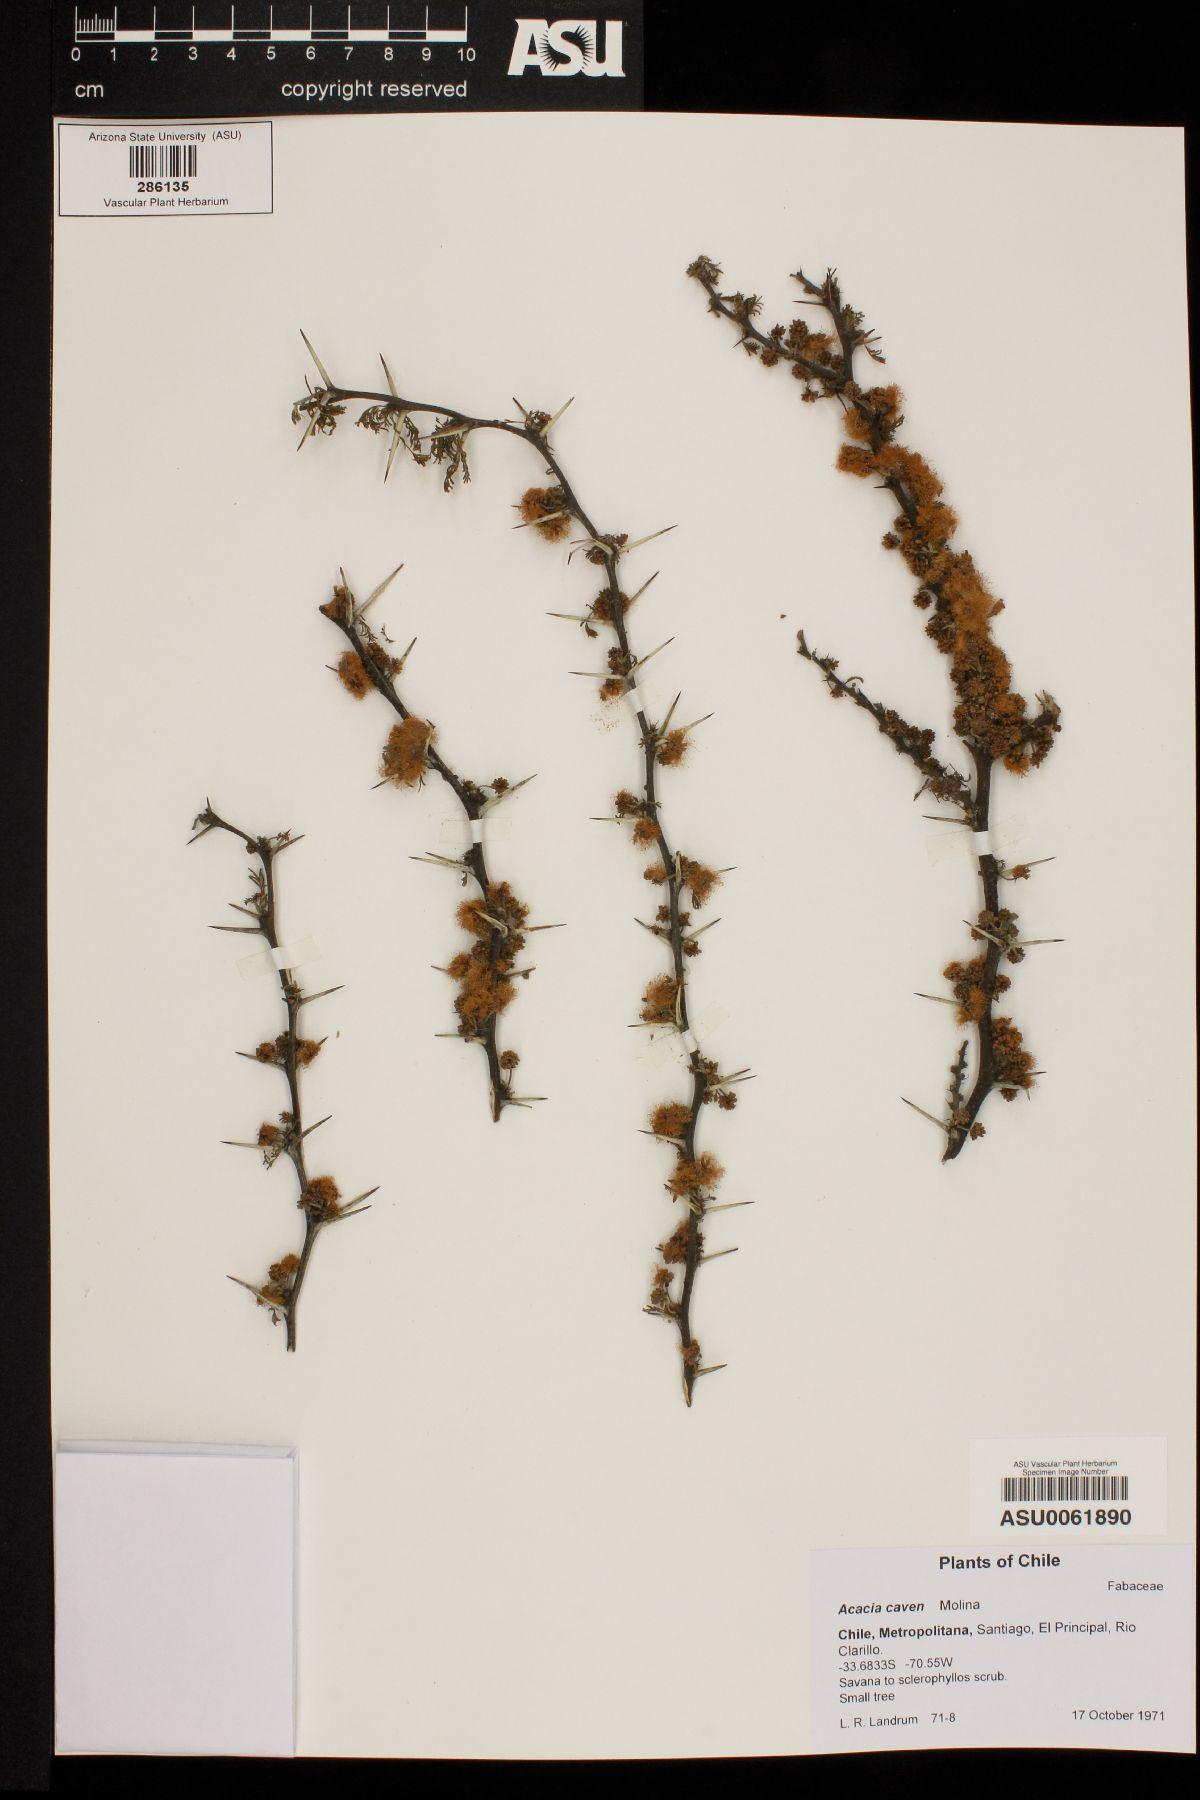 Acacia caven image